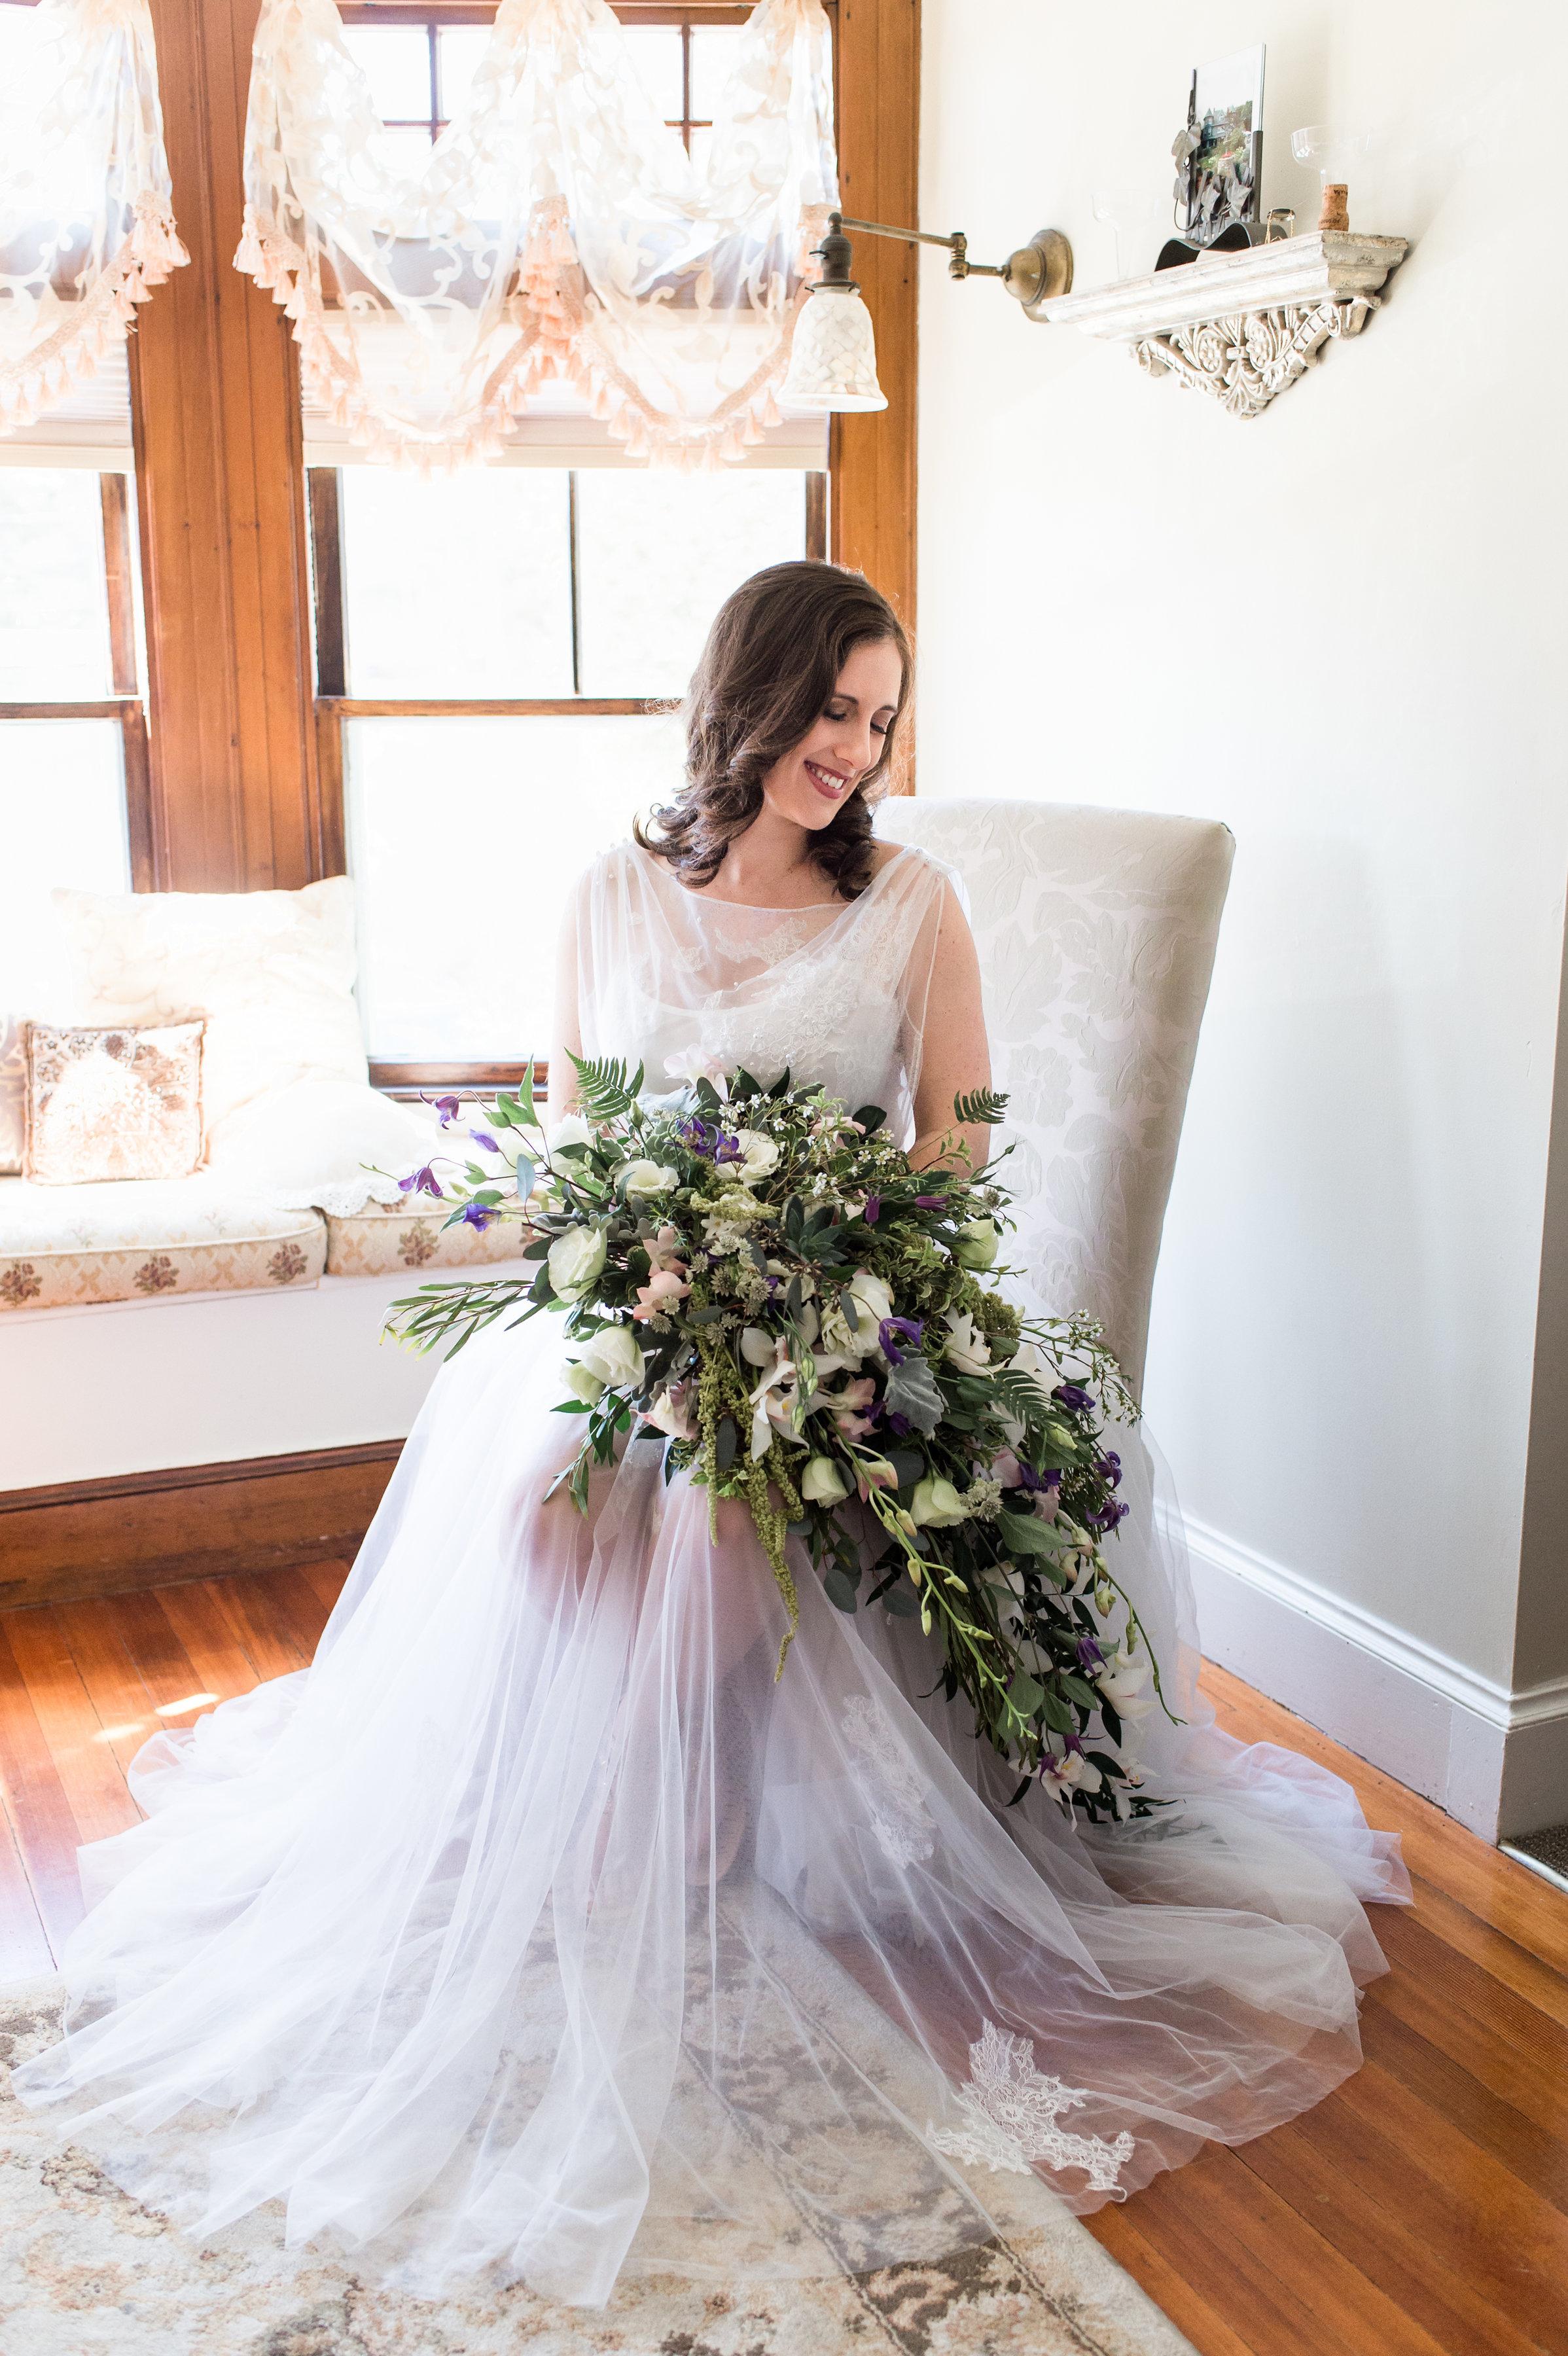 coastal wedding photoshoot unique two piece wedding dress with cascade purple and white bouquet